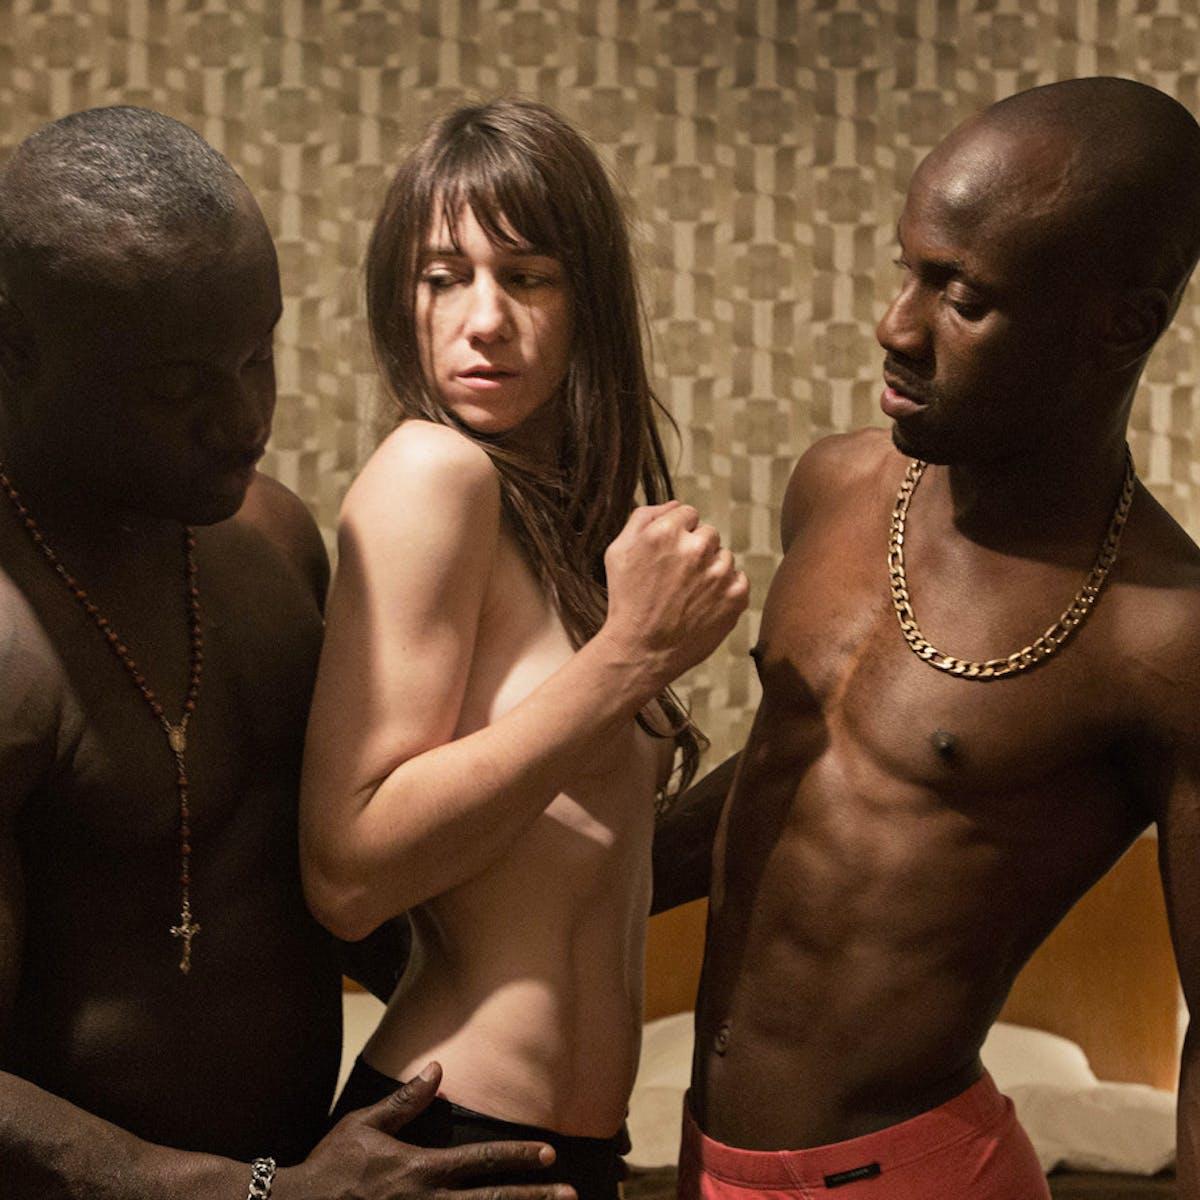 Actores Porno Españoles Bodybuilder von trier's nymphomaniac and the oddity of real sex on screen